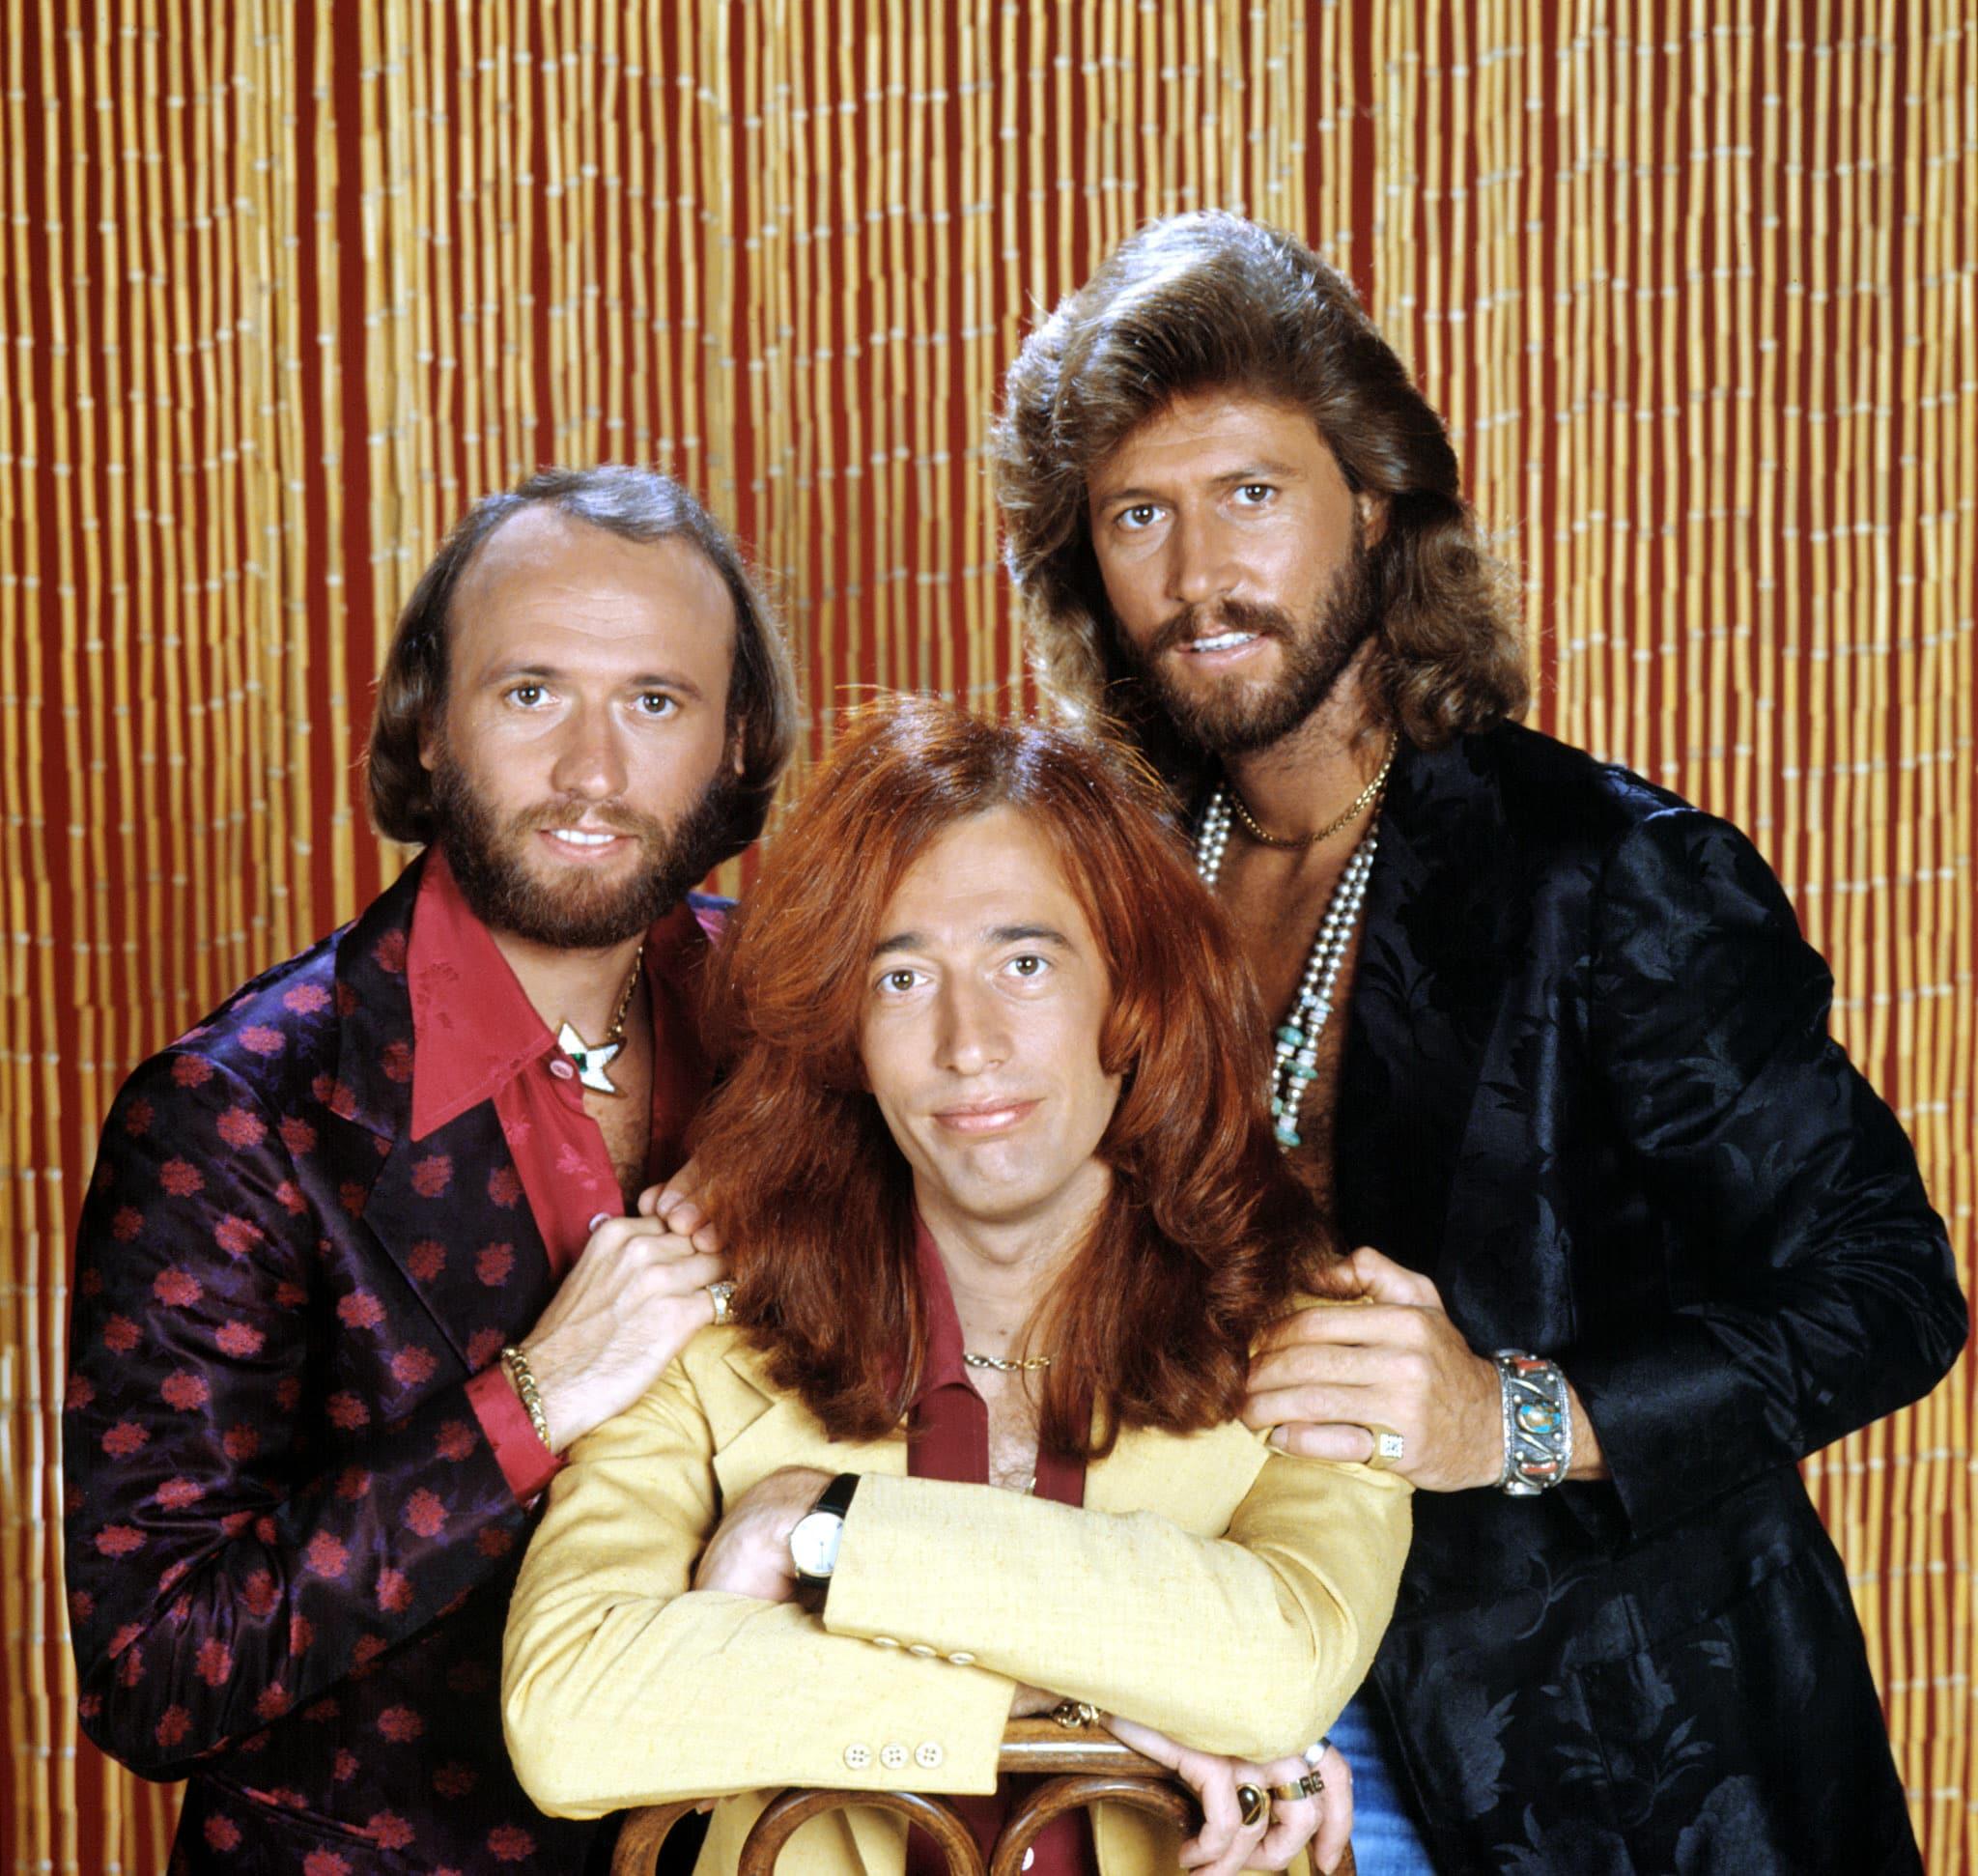 BEE GEES, Maurice Gibb, Robin Gibb, Barry Gibb, circa mid-1970s